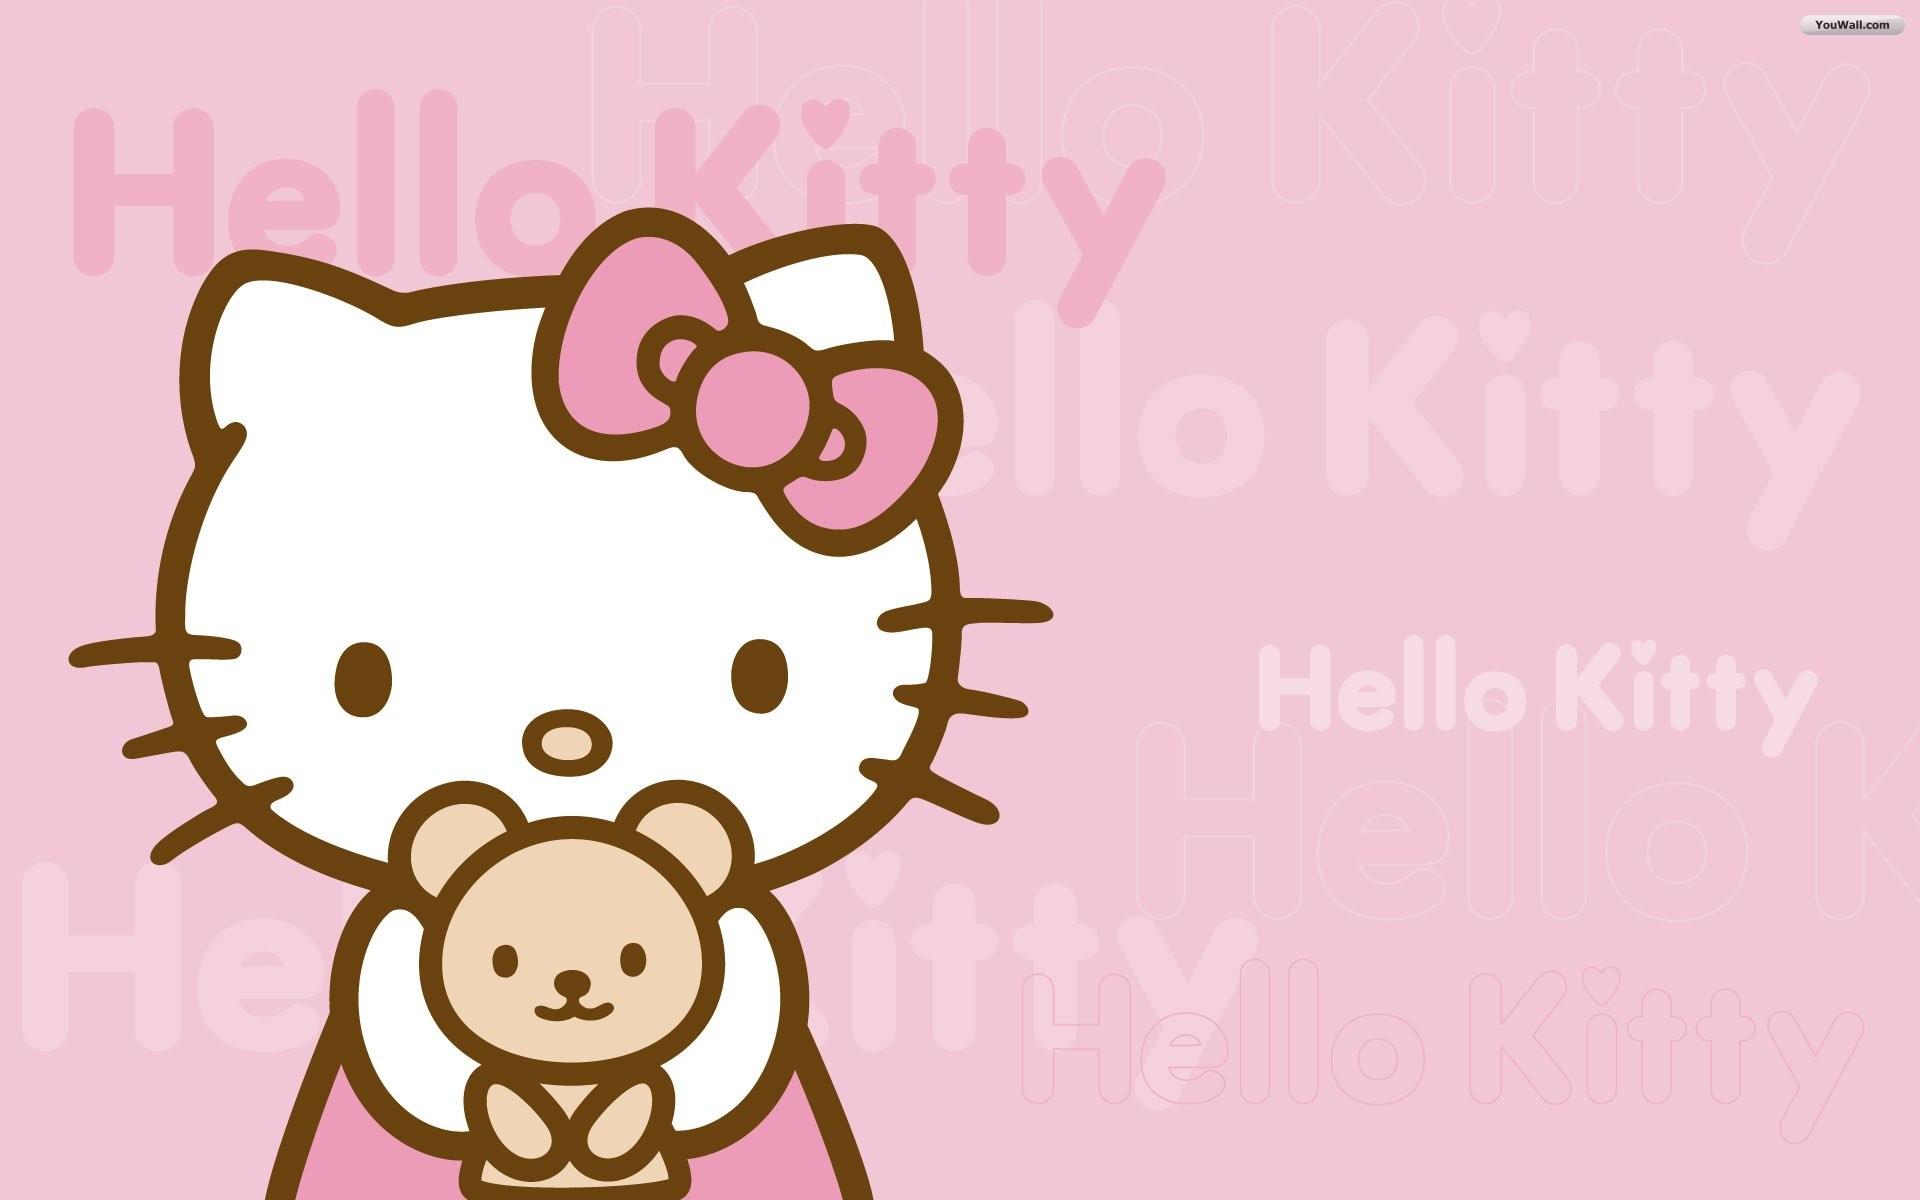 1920x1200 Pink Car Youwall Hello Kitty Free 124037 Wallpaper